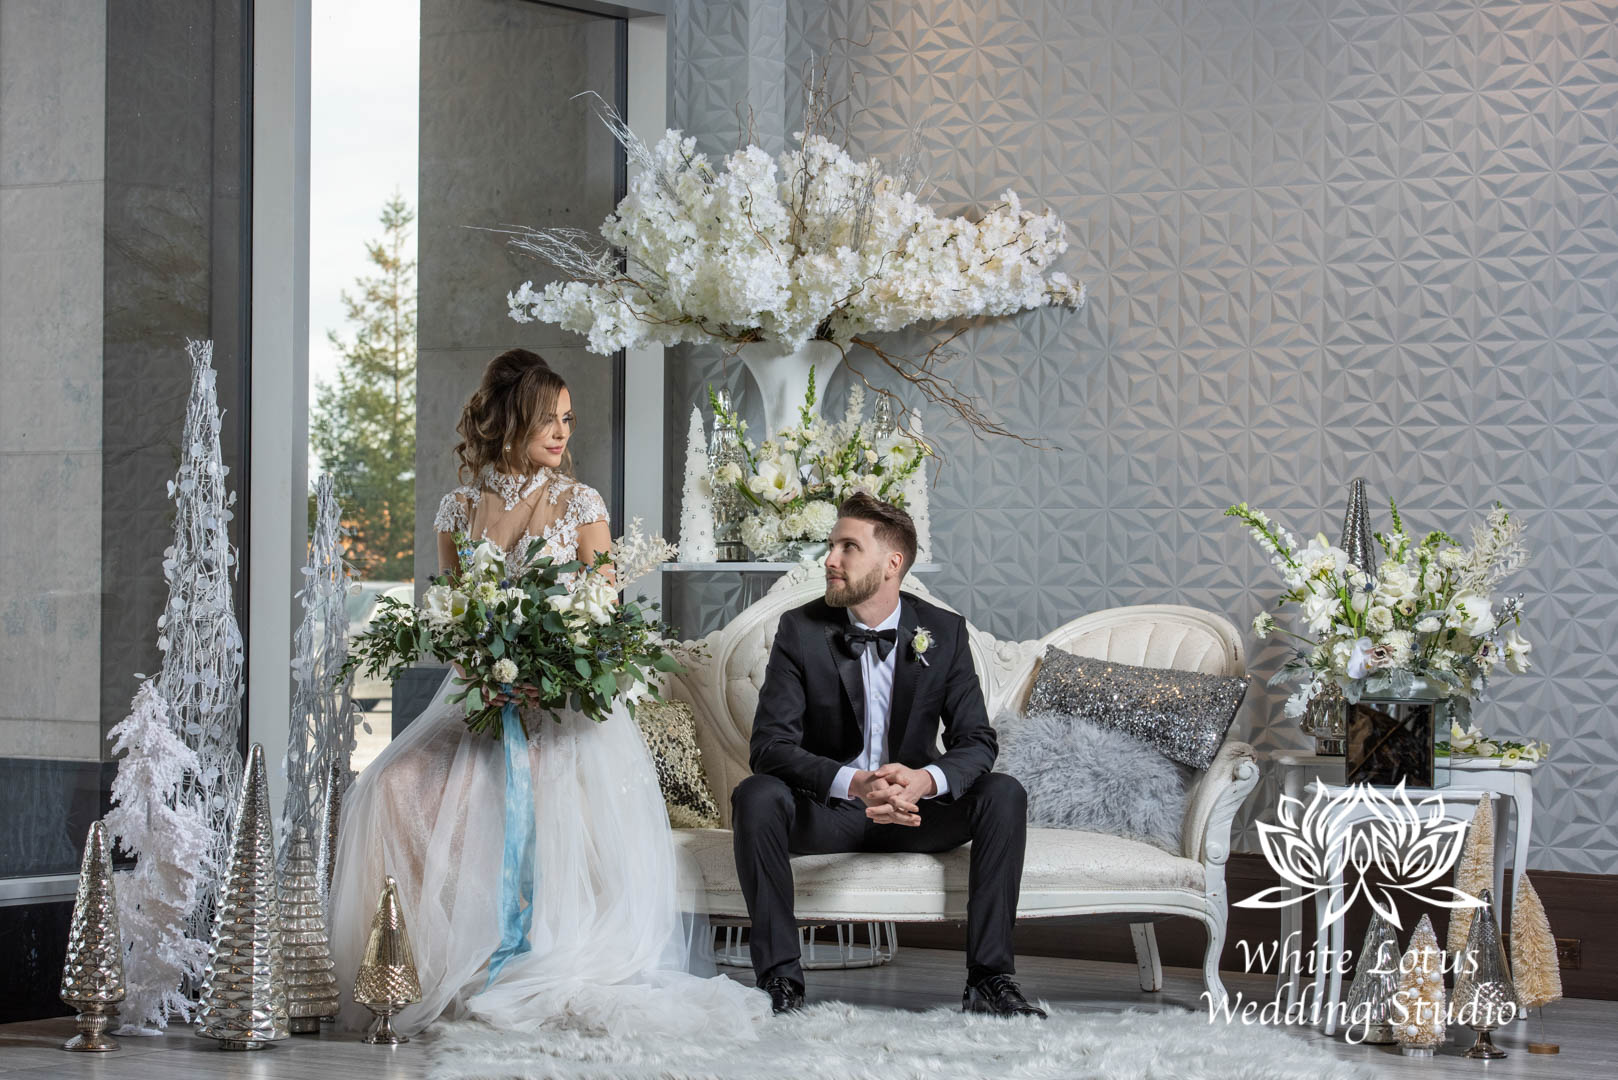 073- GLAM WINTERLUXE WEDDING INSPIRATION